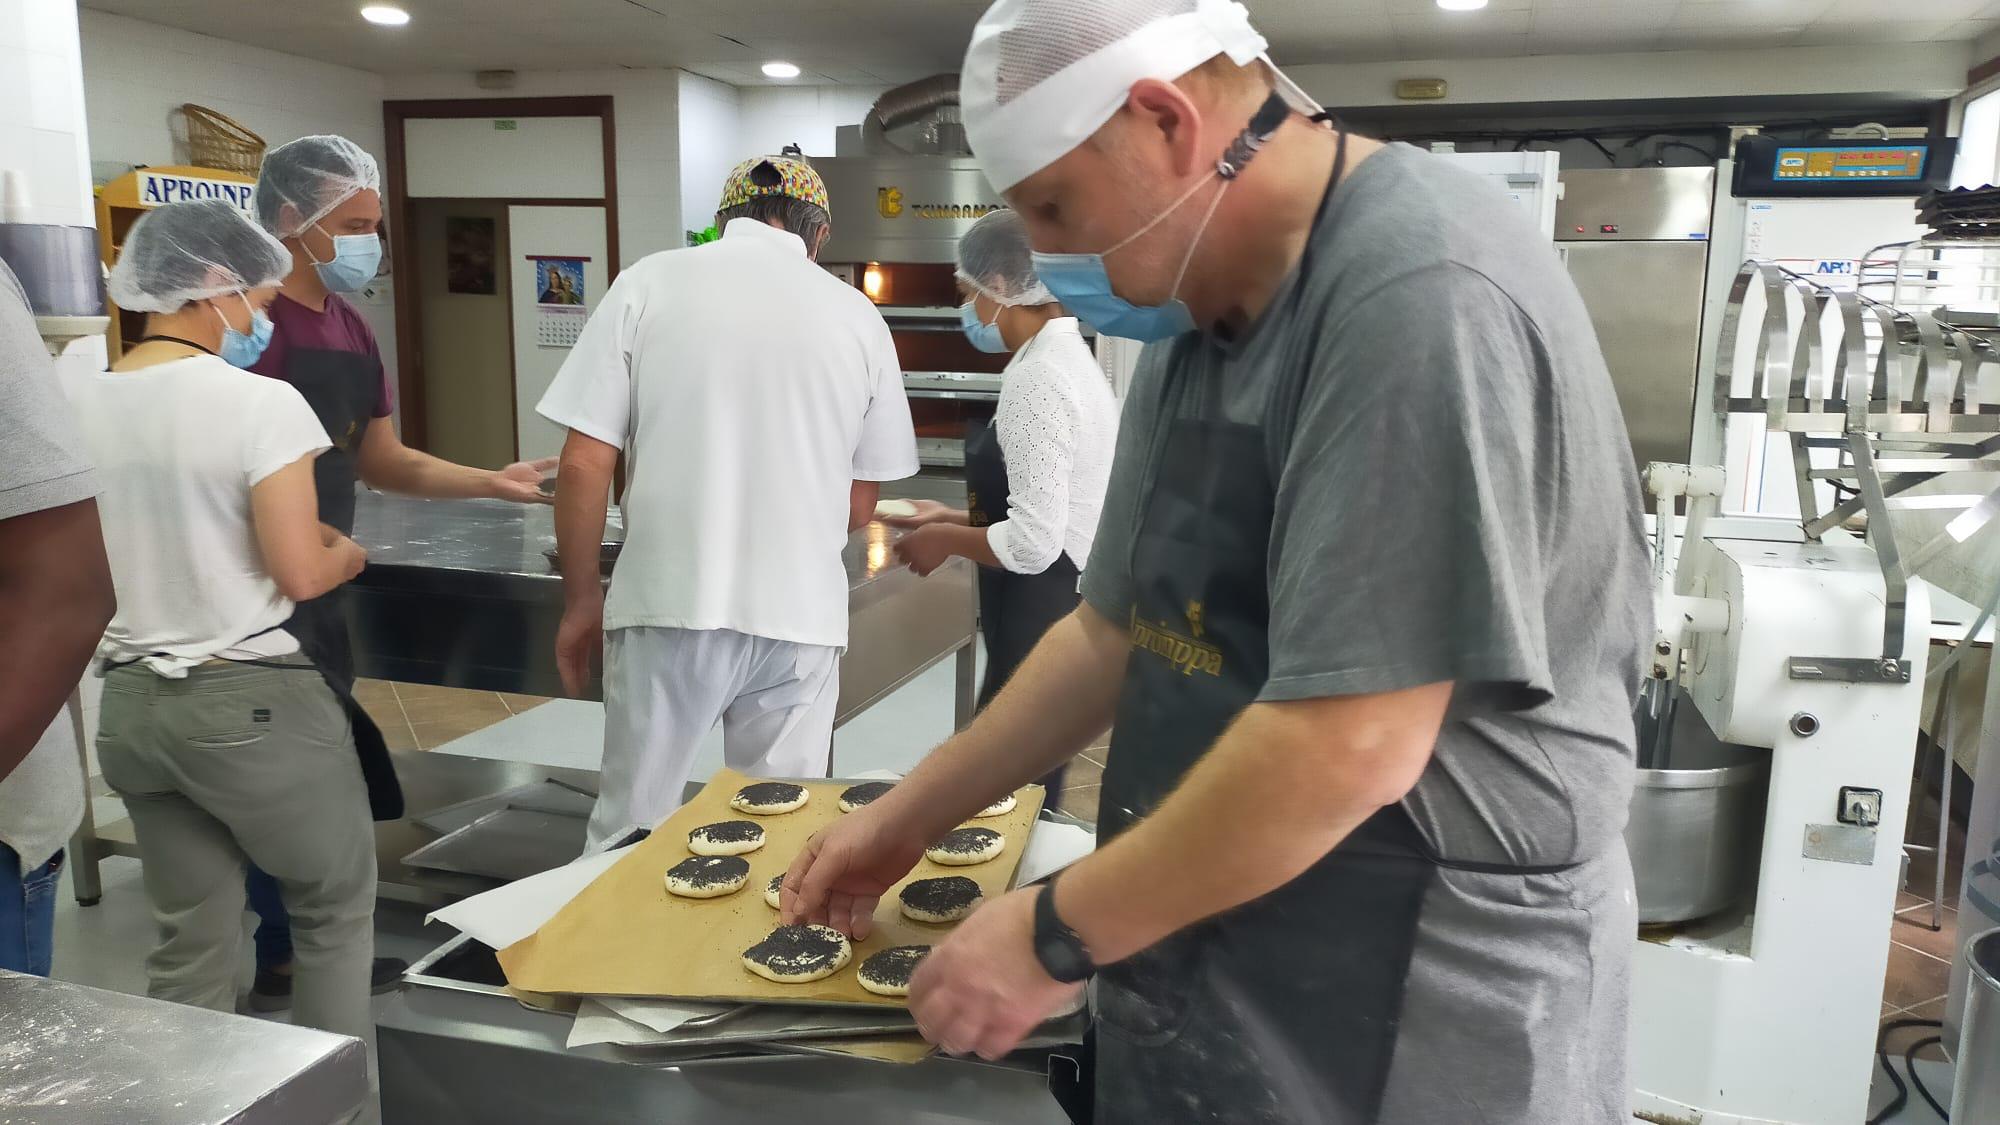 elaboraciones-curso-panaderia-pasteleria-bolleria